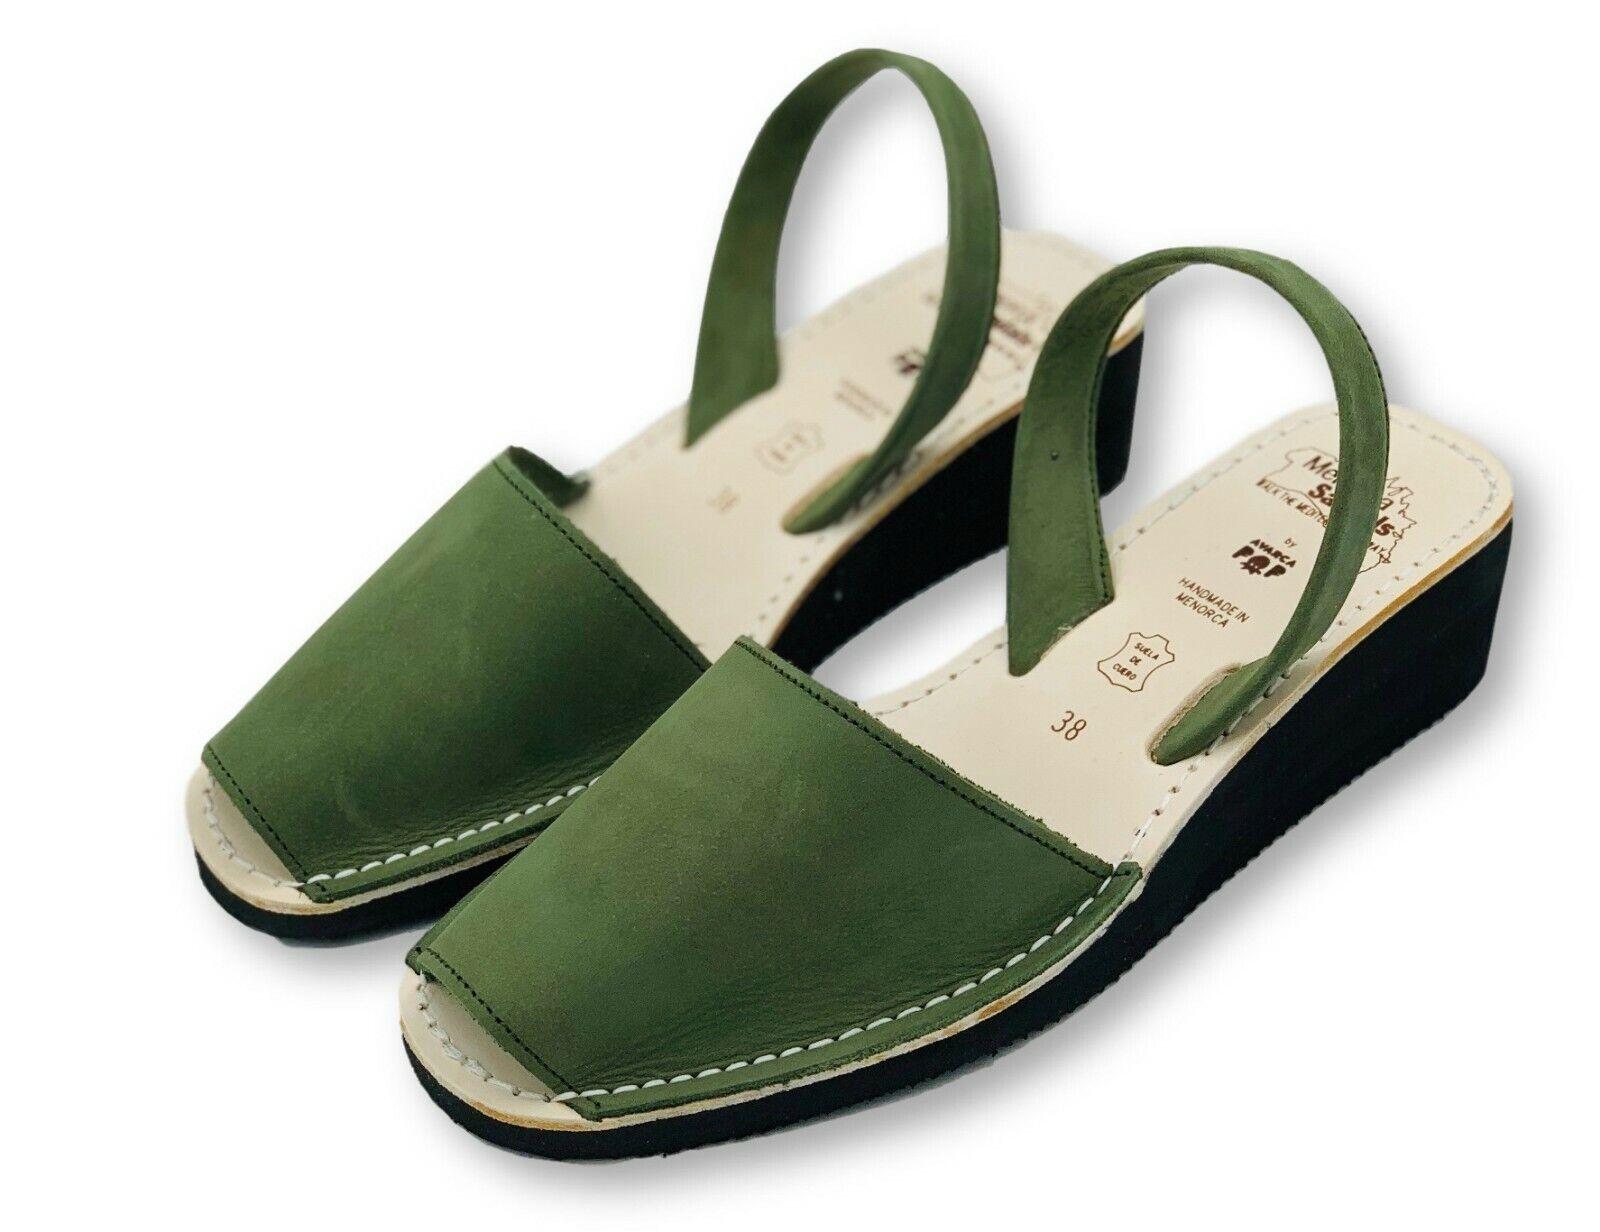 Menorca Sandals Green Mid Wedge Avarcas, Original Handmade in Menorca Wedge